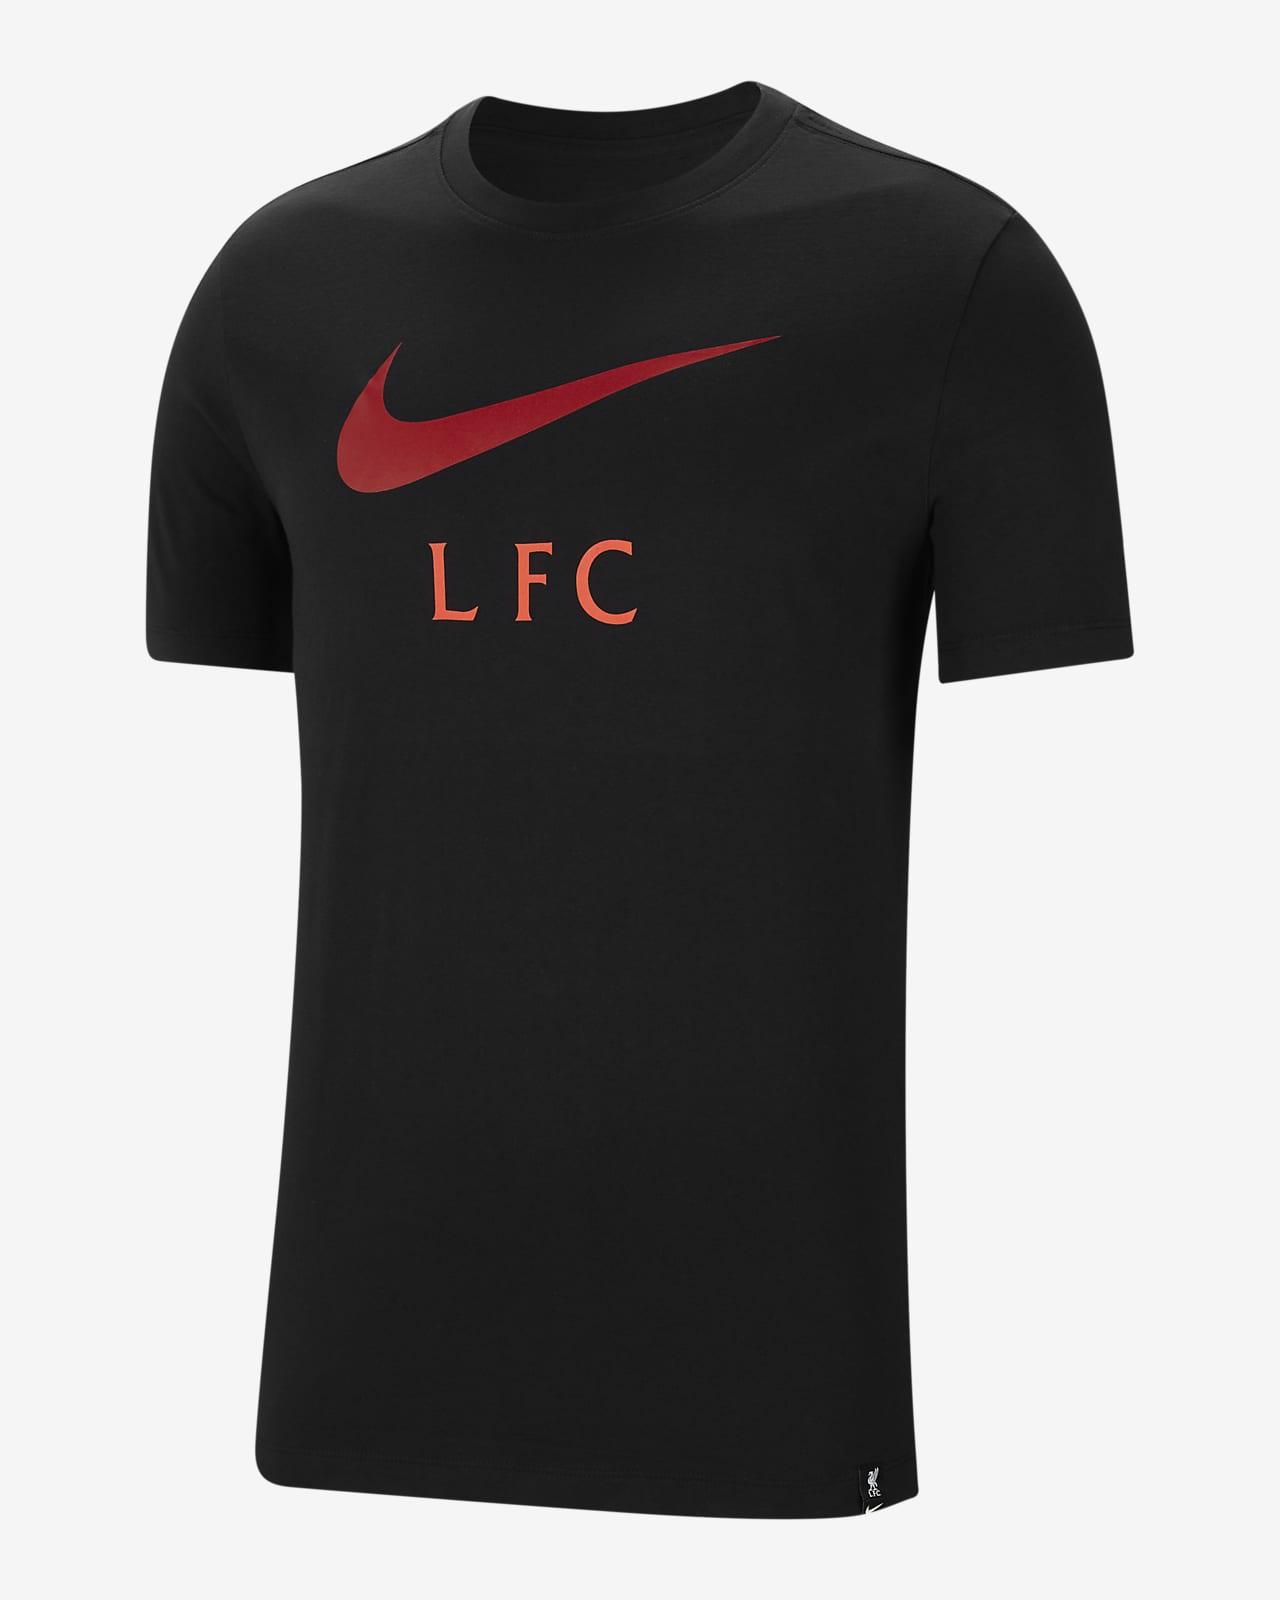 Liverpool FC Men's Soccer T-Shirt